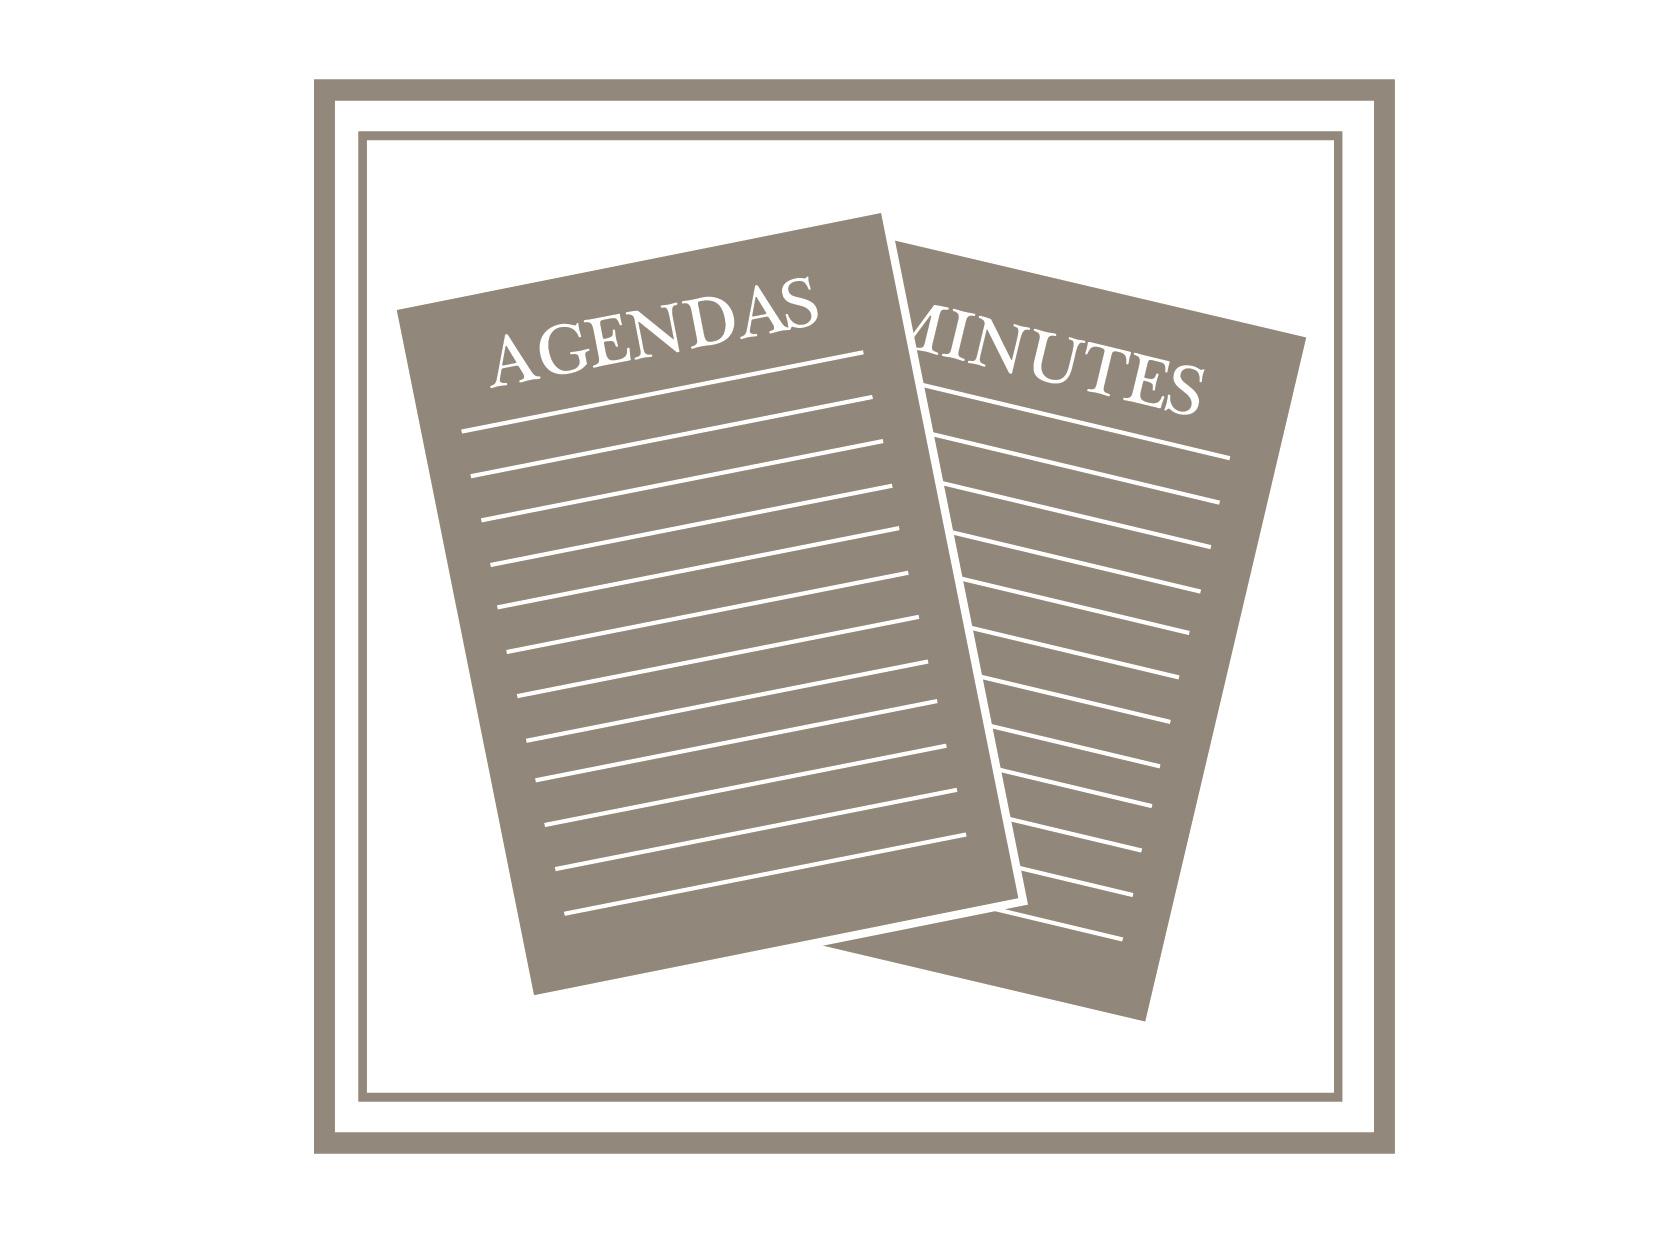 agendas minutes